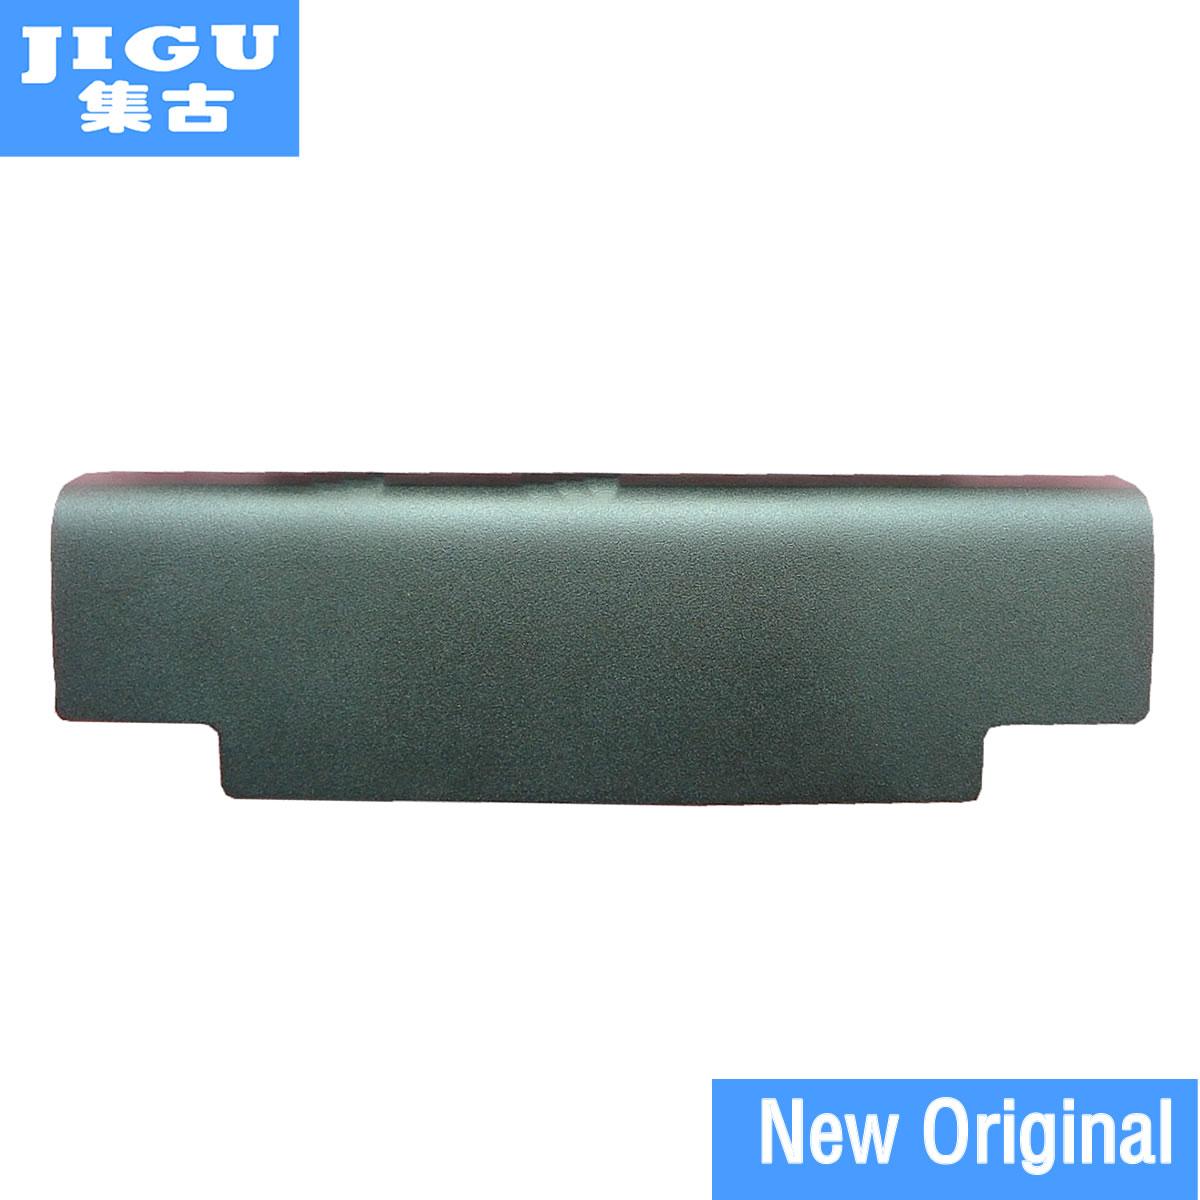 JIGU الأصلي بطارية كمبيوتر محمول لديل انسبايرون ميني 1012 1018 2T6K2 312-0966 312-0967 3K4T8 854TJ 8PY7N CMP3D G9PX2 NJ644 T96F2